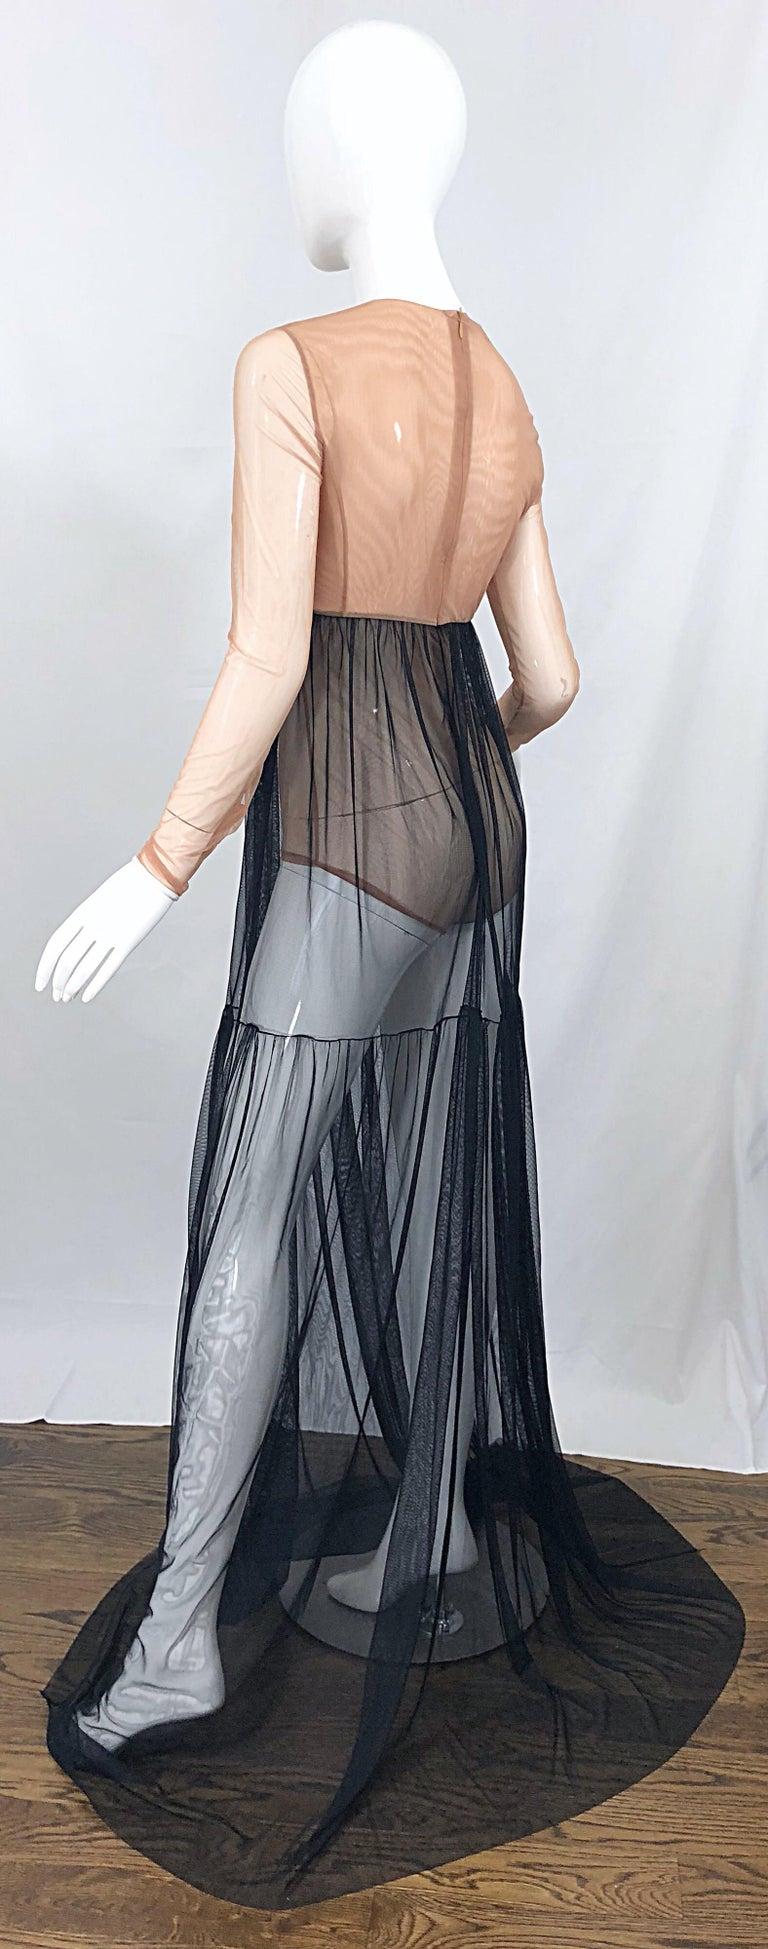 Michael Kors Collection Sz 4 Nude + Black Sheer Runway Mesh Bodysuit Gown Dress For Sale 8